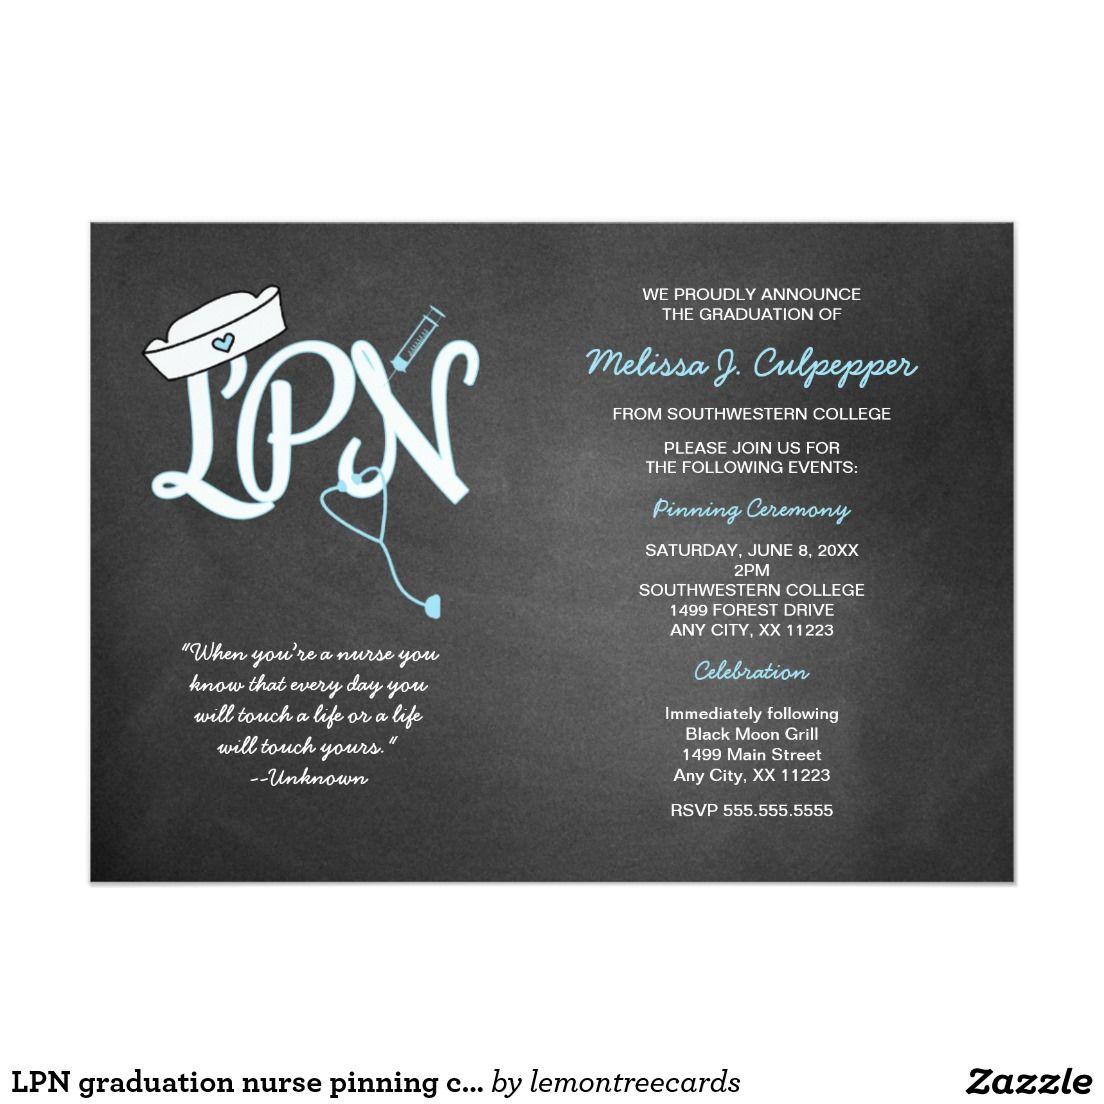 Lpn Graduation Nurse Pinning Ceremony Invites